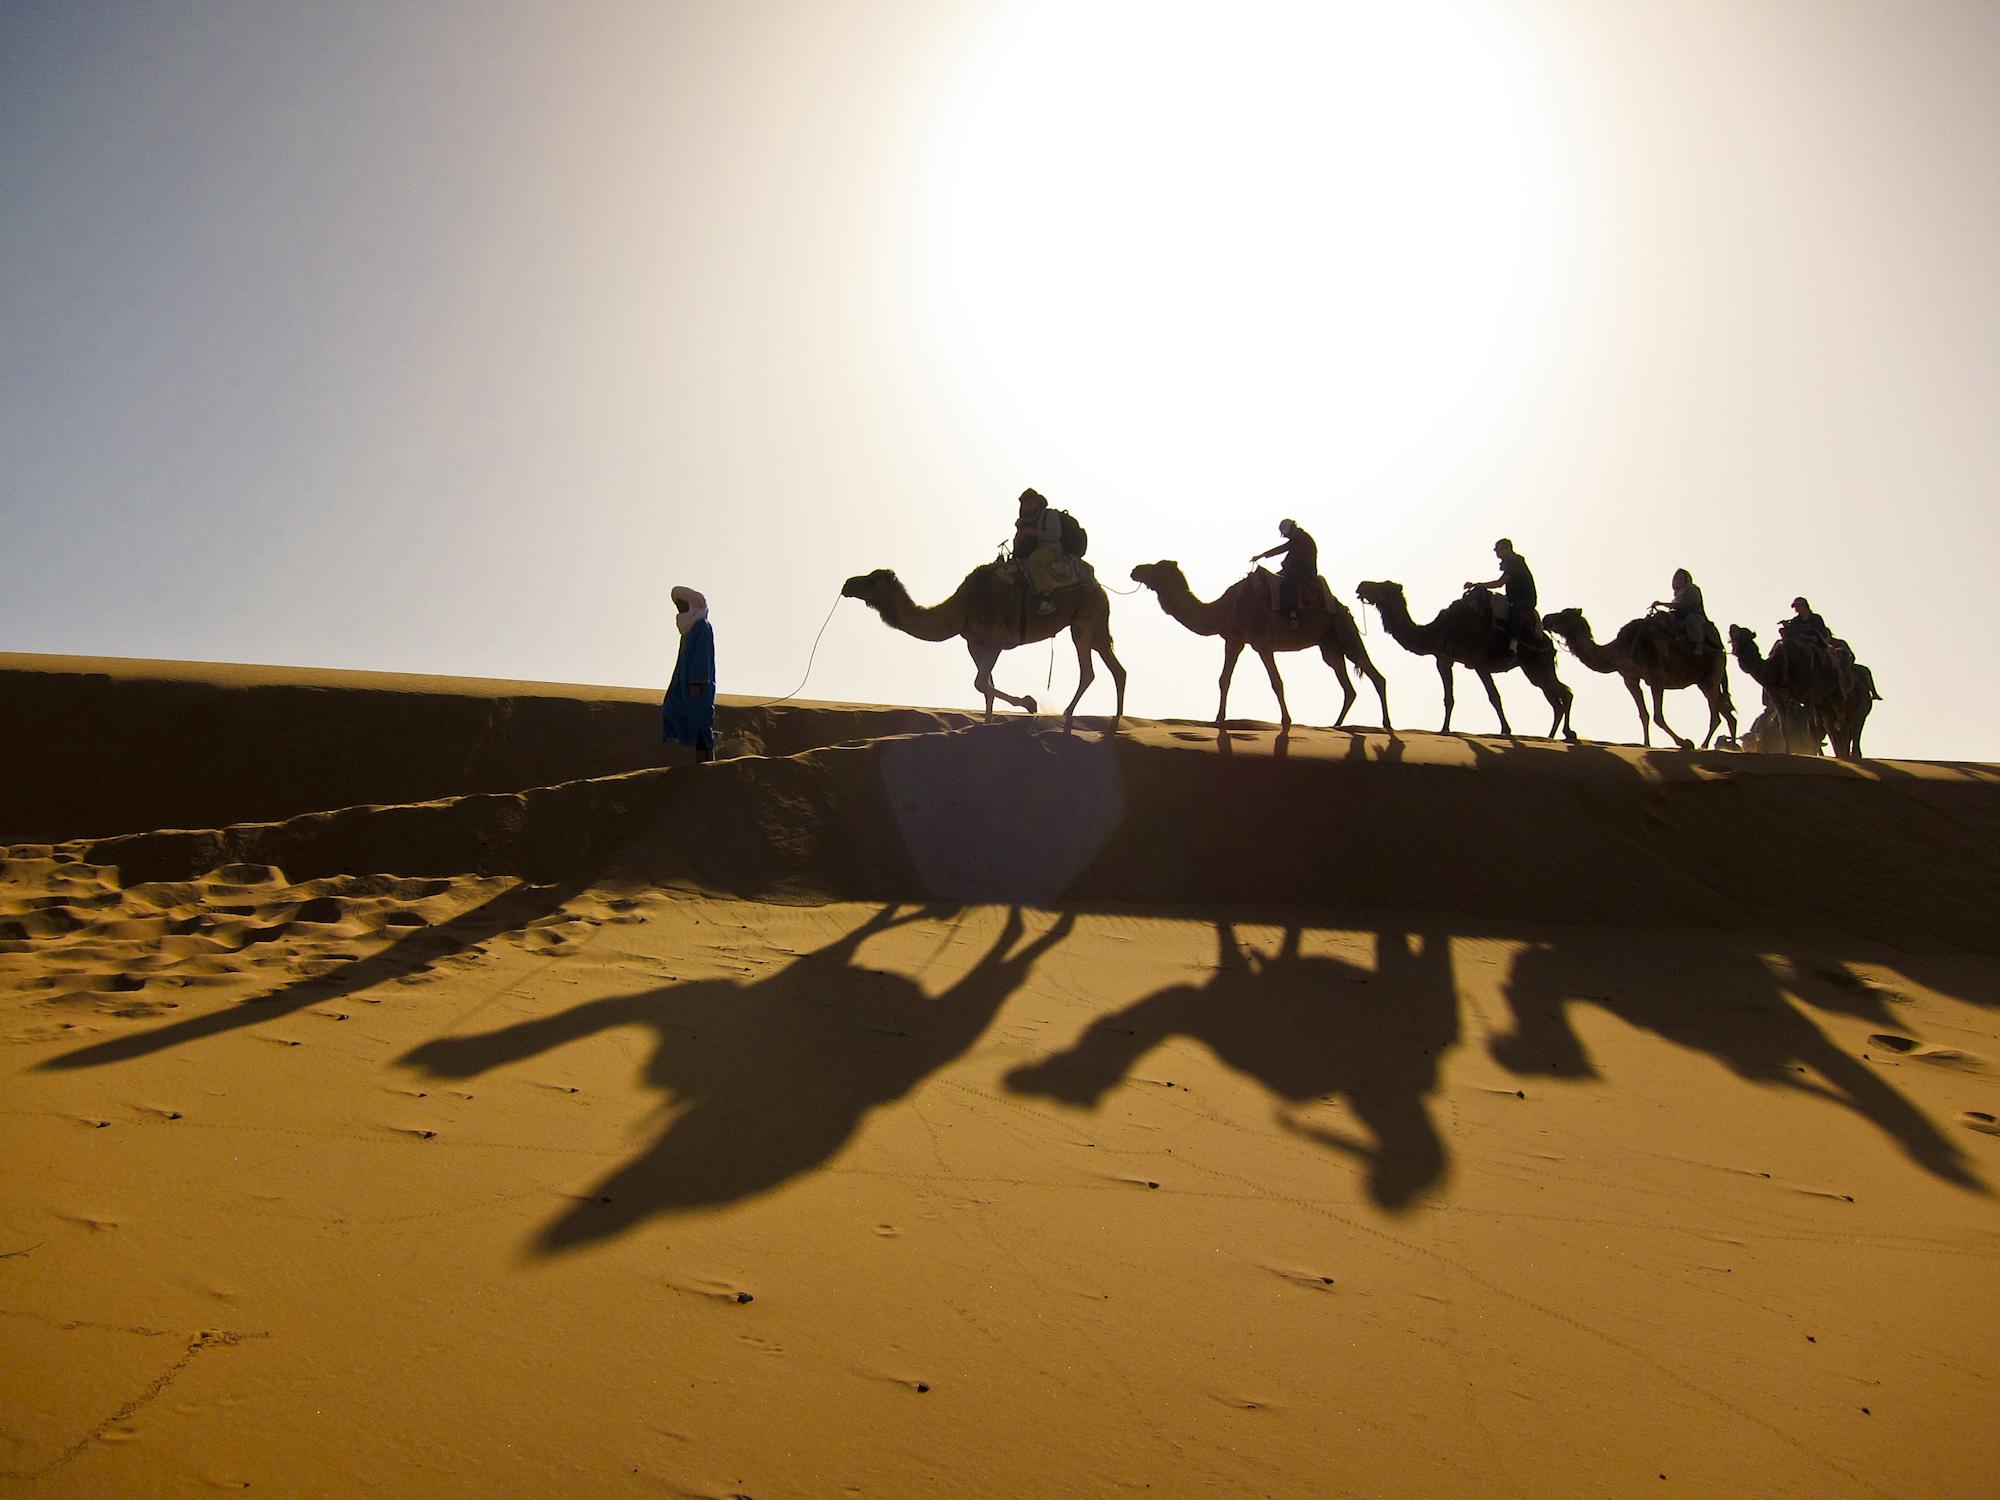 Sahara-IMG_3779-Zack-Woolwine.jpg